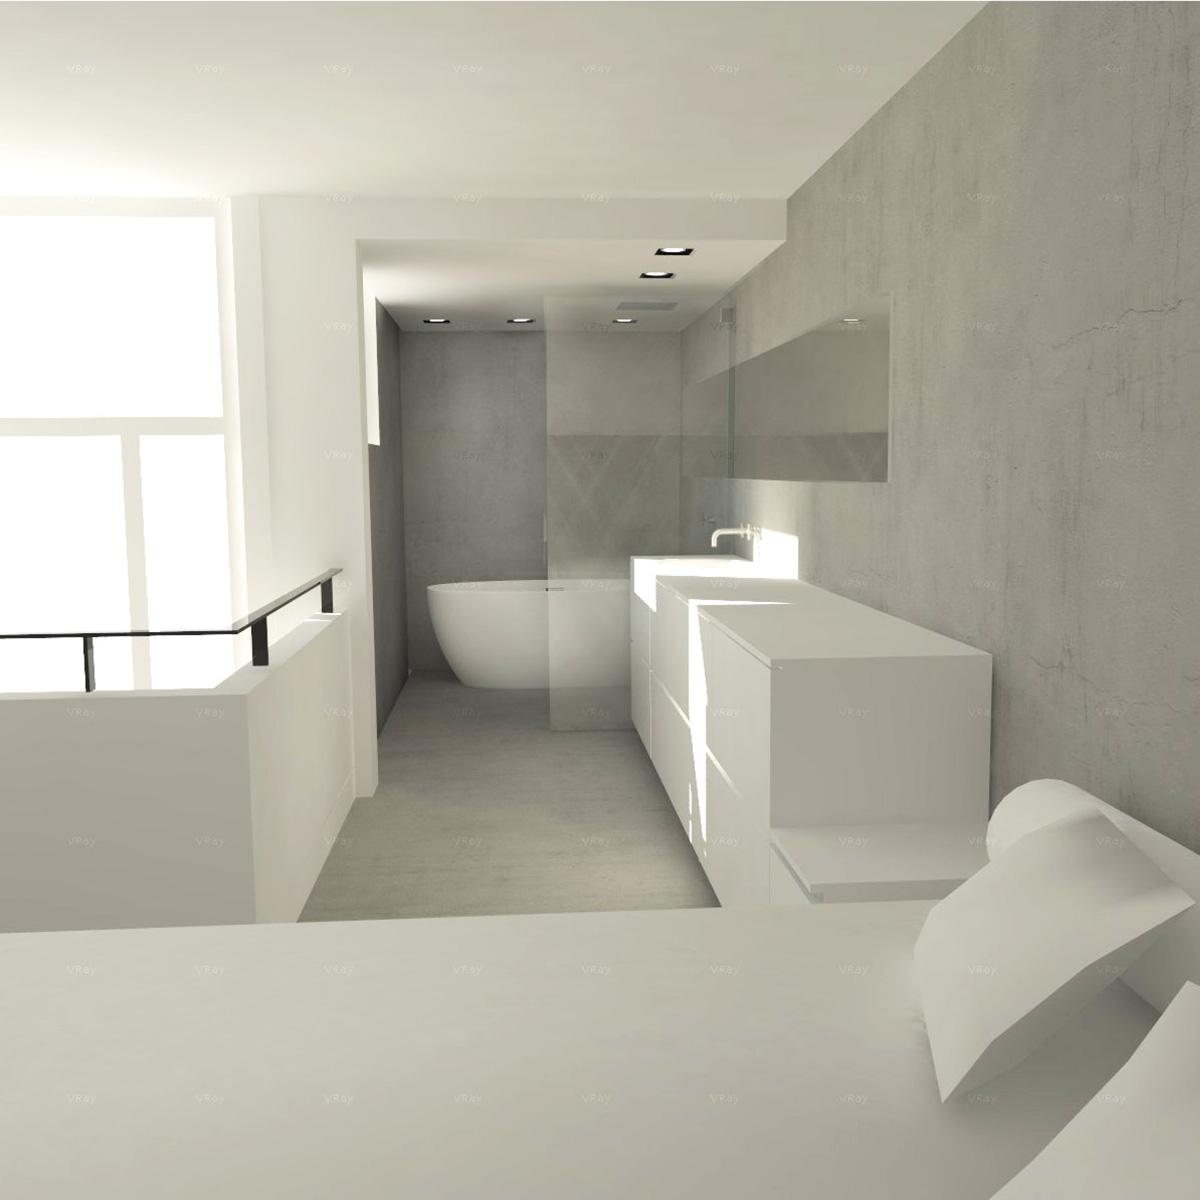 impressie slaapkamer en open badkamer | micromacrodesign